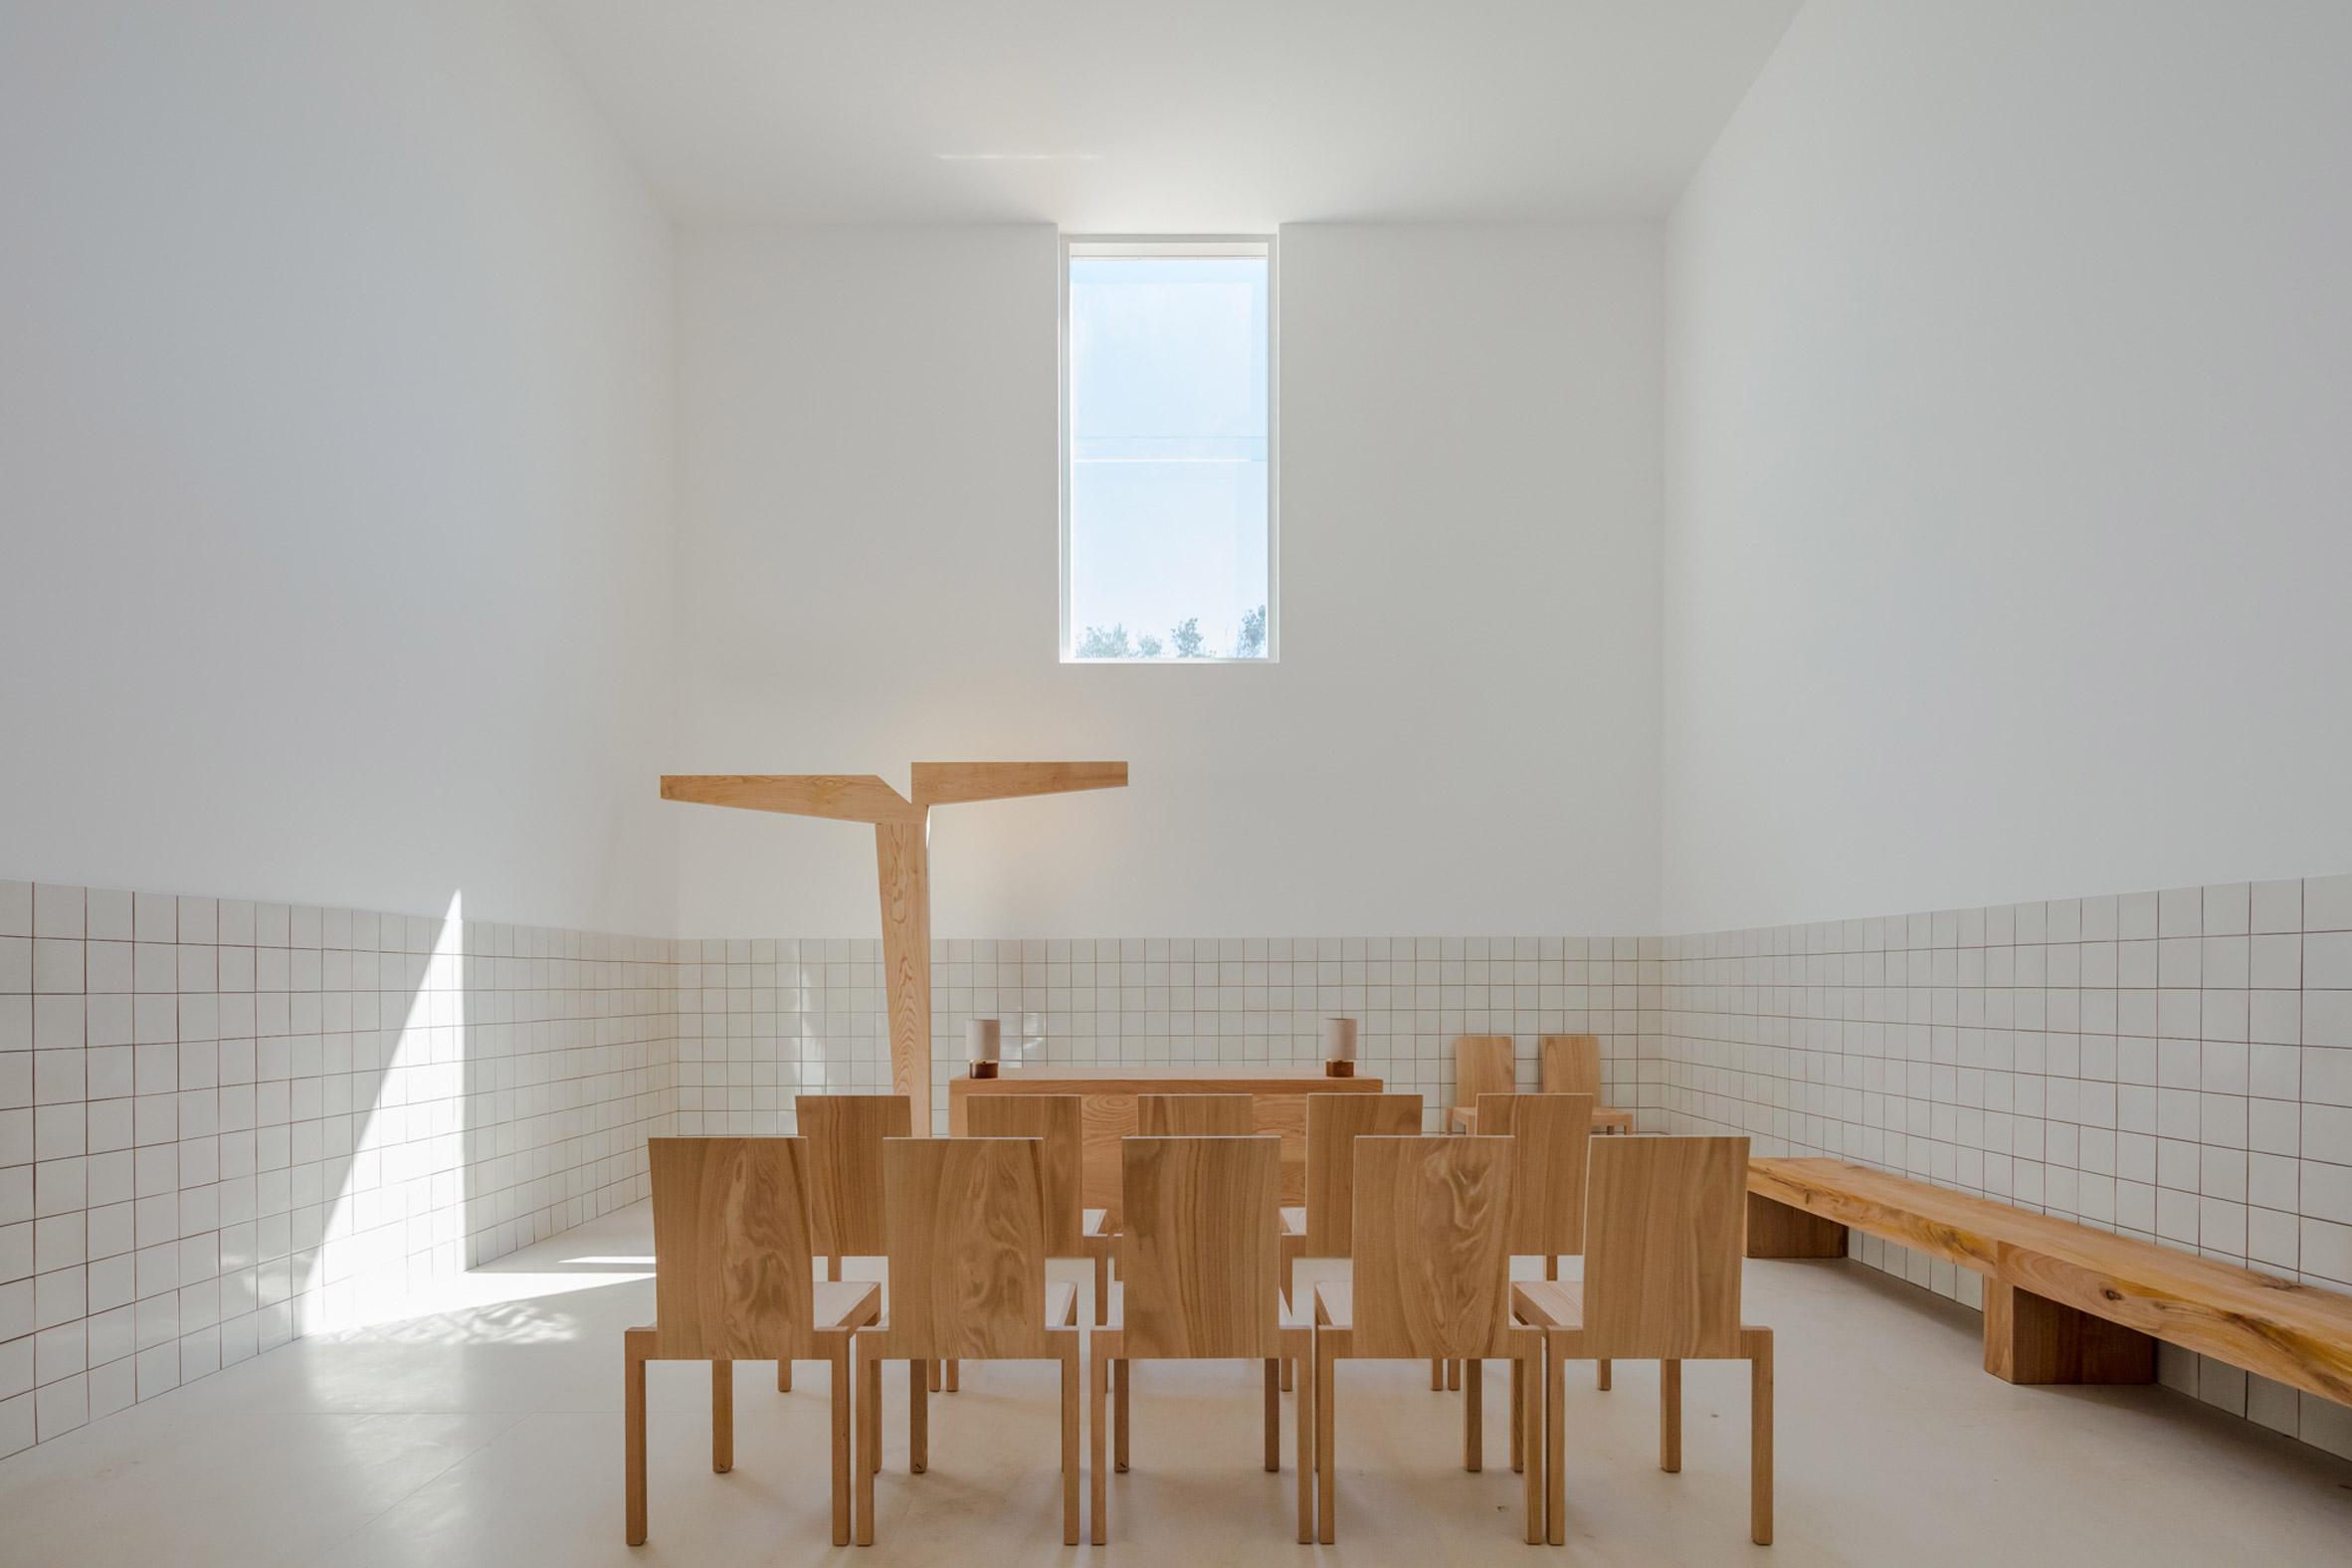 alvaro-siza-viera-capela-do-monte-chapel-algarve_dezeen_2364_col_6